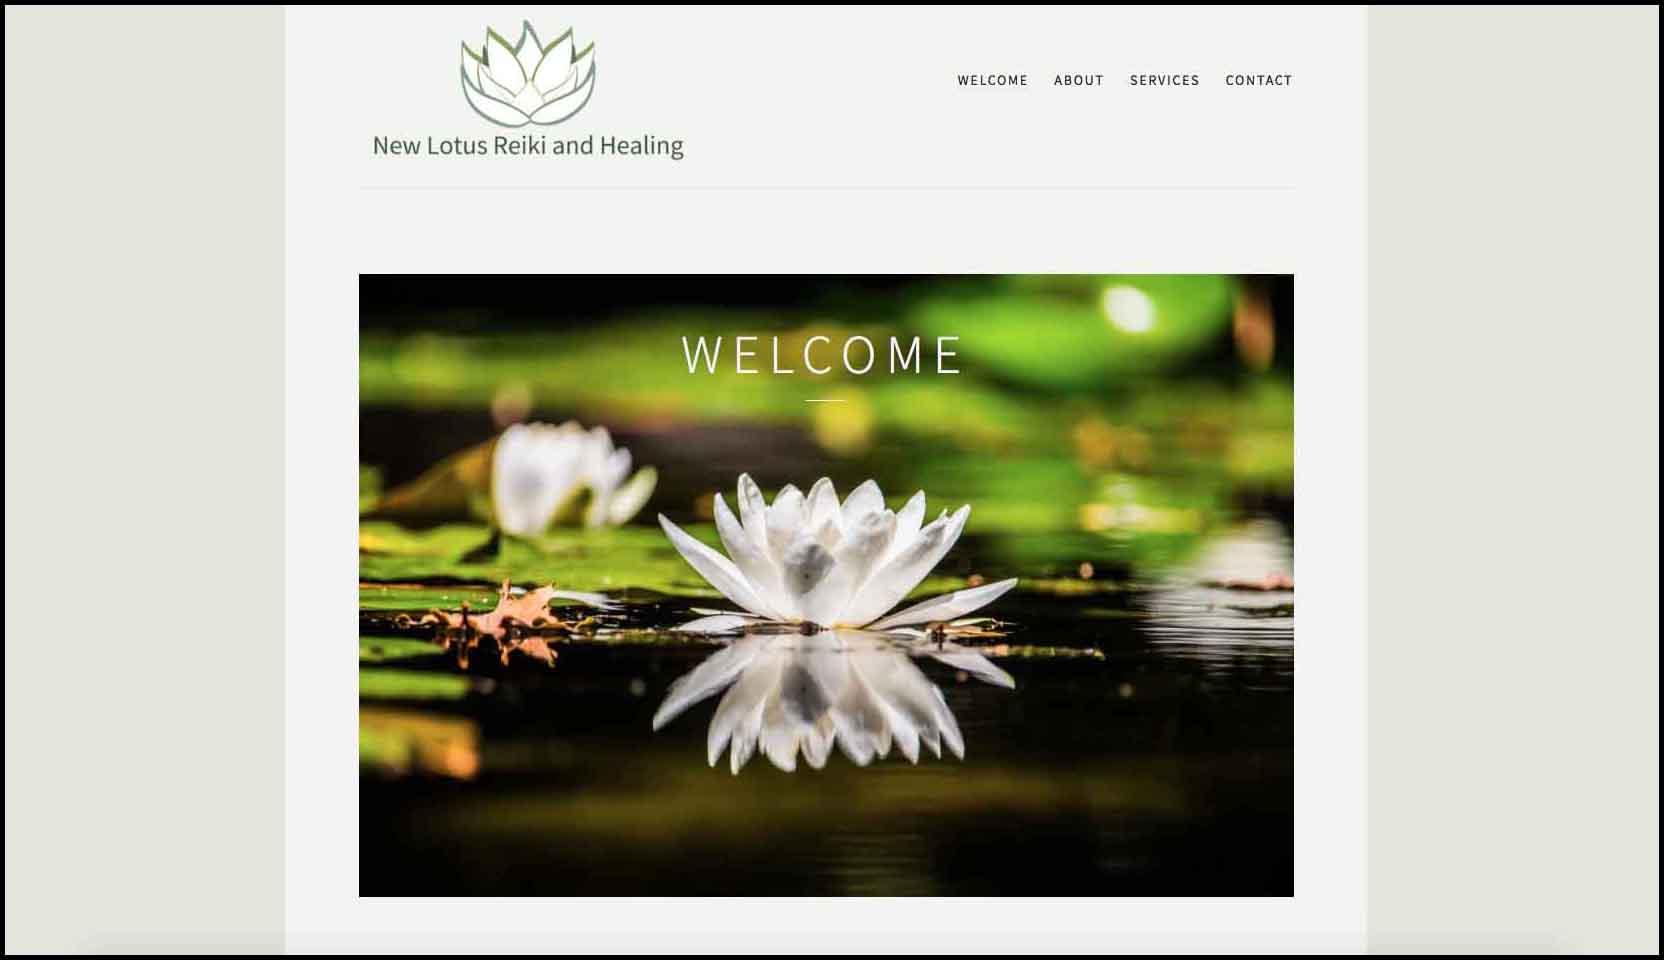 New Lotus Reiki and Healing